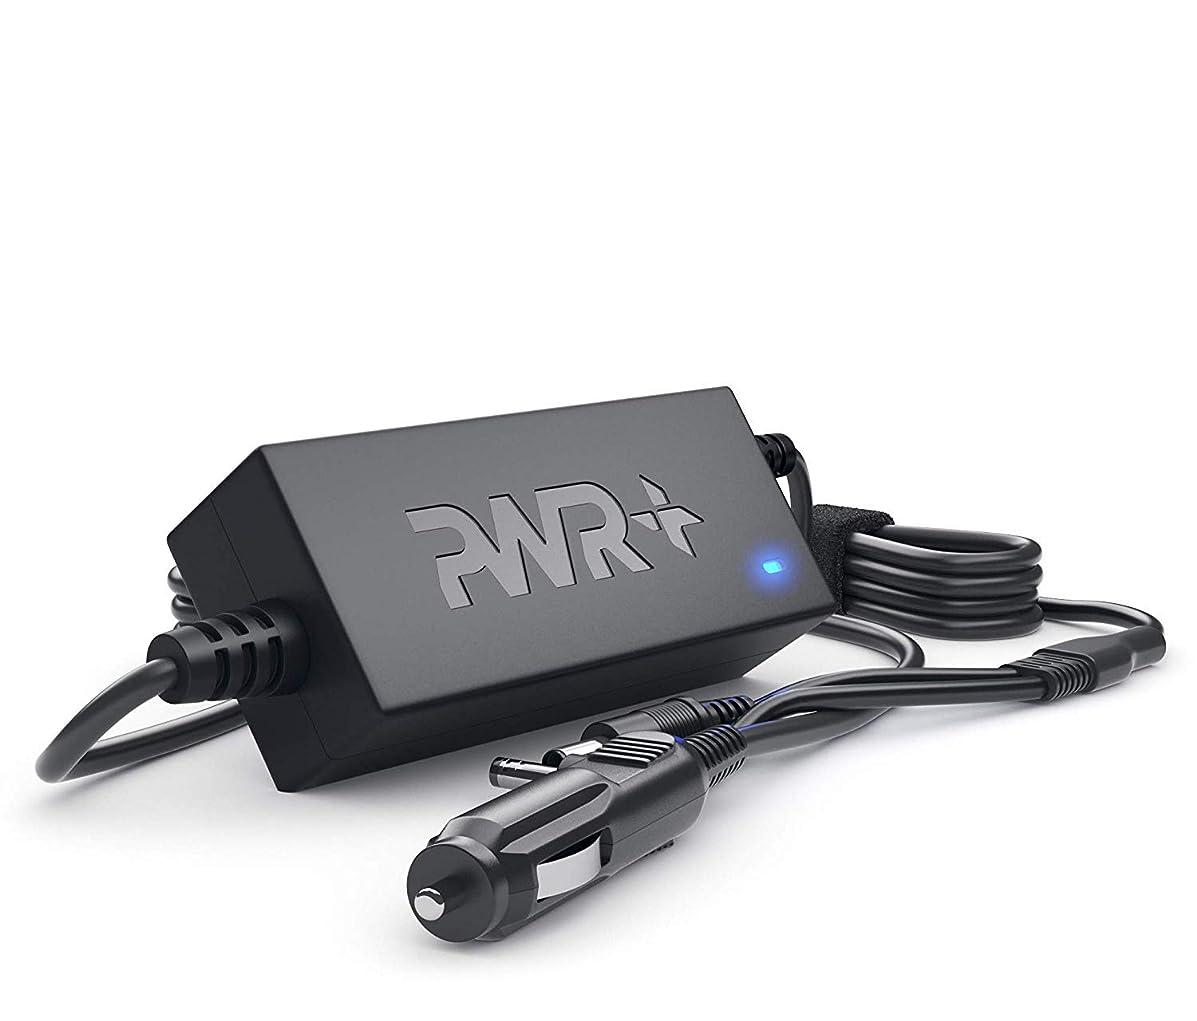 CAR Charger 90W 65W 45W for HP-Envy-Pavilion Touchsmart-Sleekbook 15 17 M6 M7 Series; Hp Spectre X360, Pro x360 G2; Pavilion X360 EliteBook X360 DC Auto Adapter Power Cord Extra Long 10 Ft